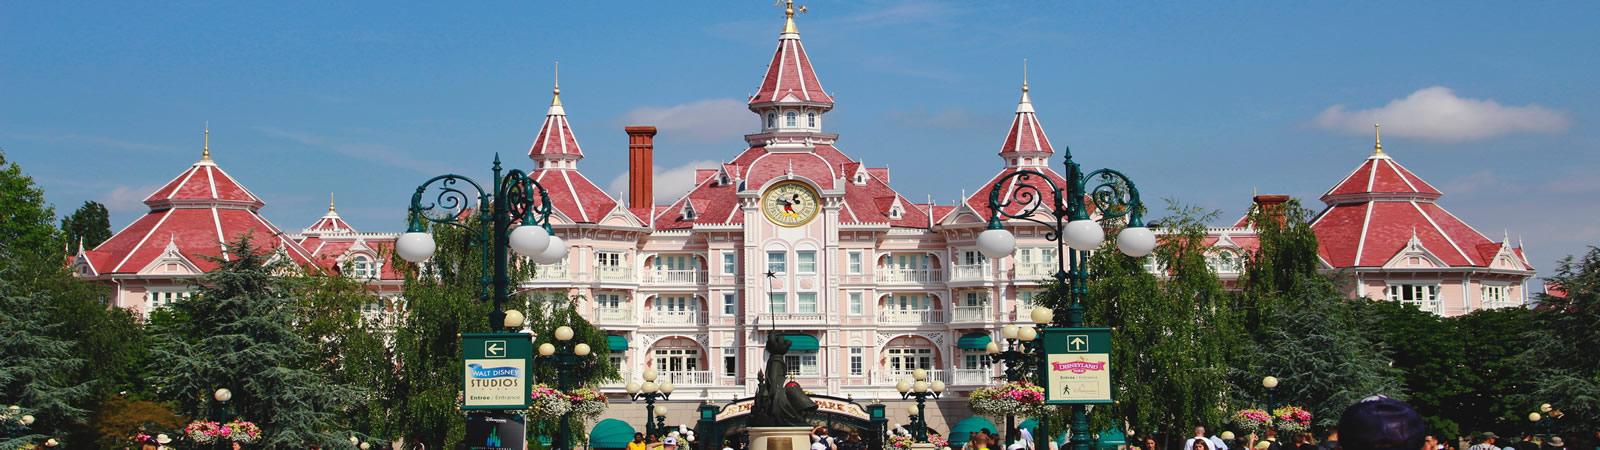 Disneyland Paris From London With Kids